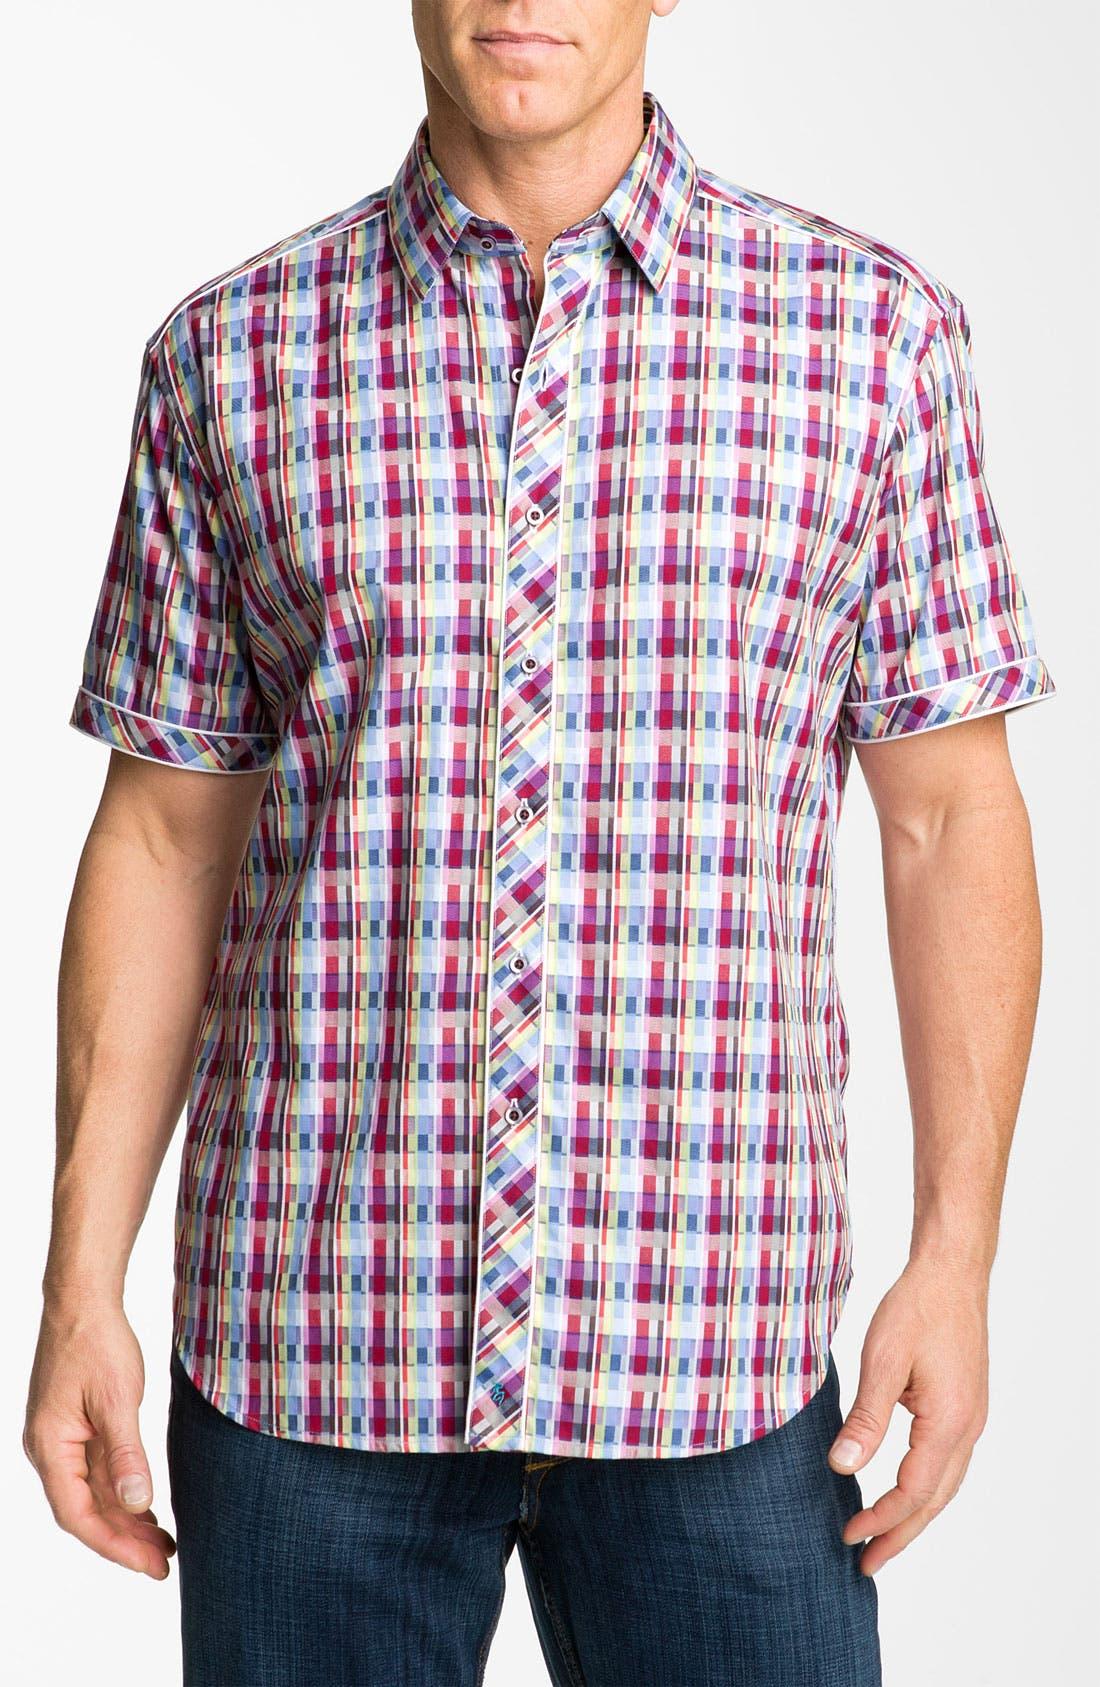 Alternate Image 1 Selected - Robert Graham 'Onset' Regular Fit Sport Shirt